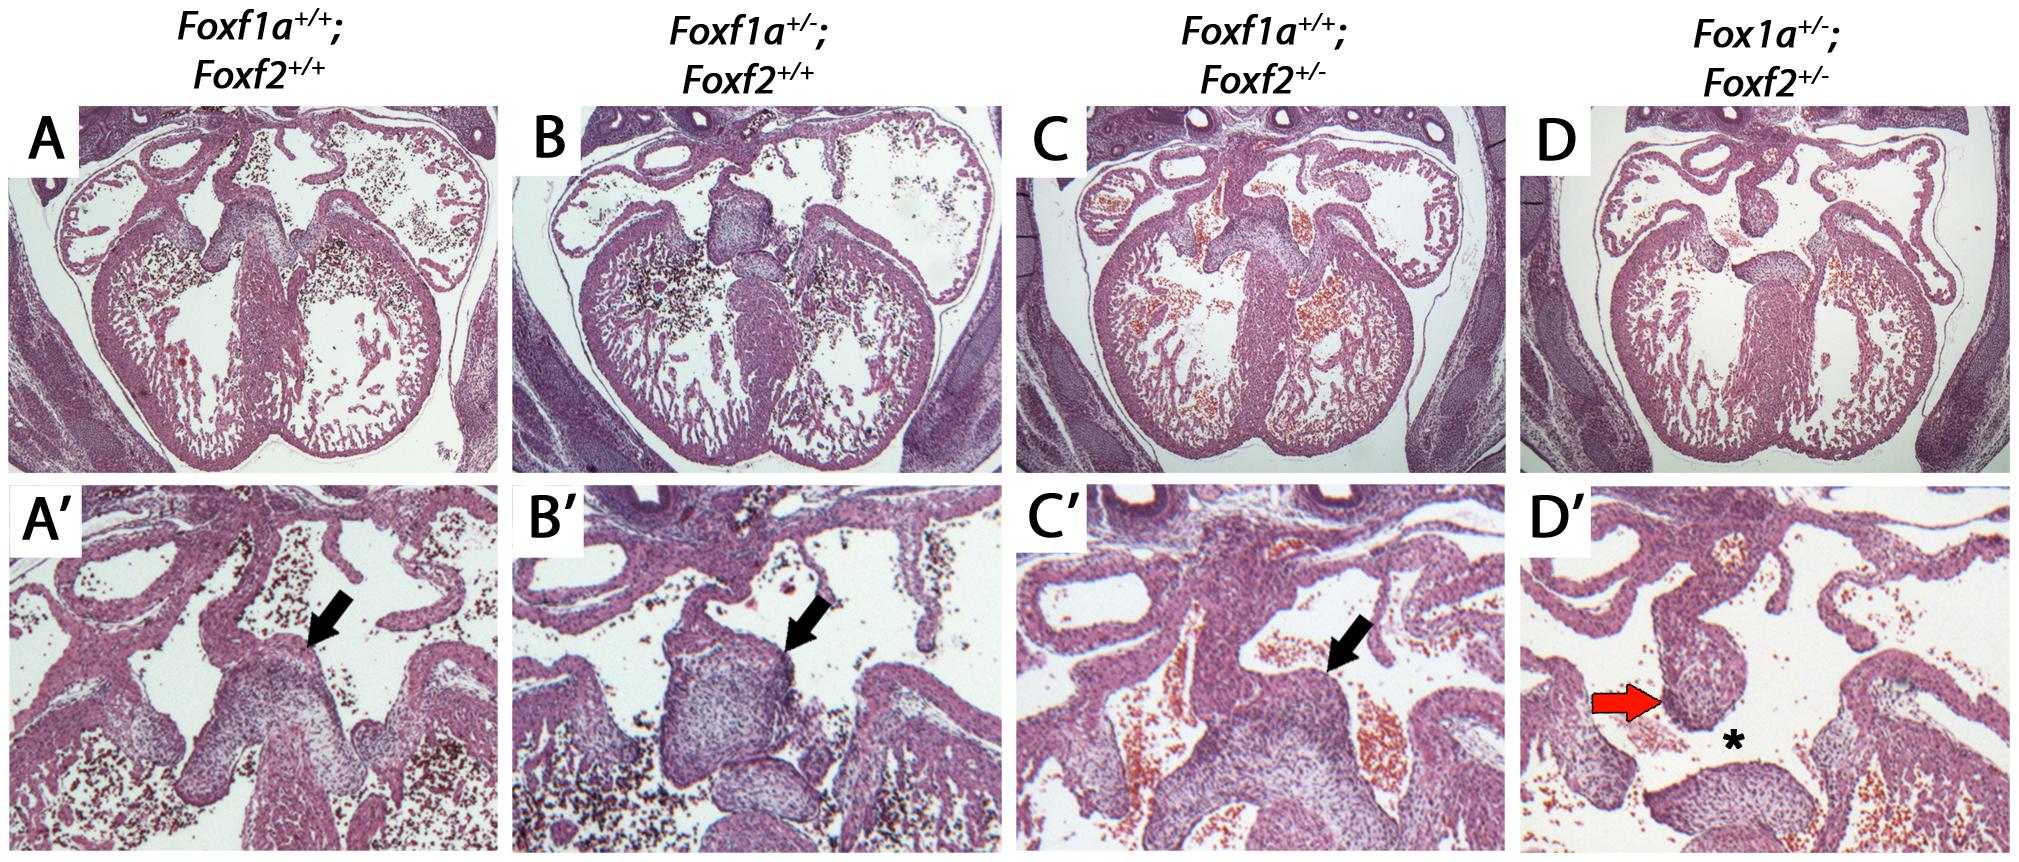 Atrioventricular septal defects in <i>Foxf1a<sup>+/−</sup>; Foxf2<sup>+/−</sup></i> compound heterozygote embryos at E14.5.